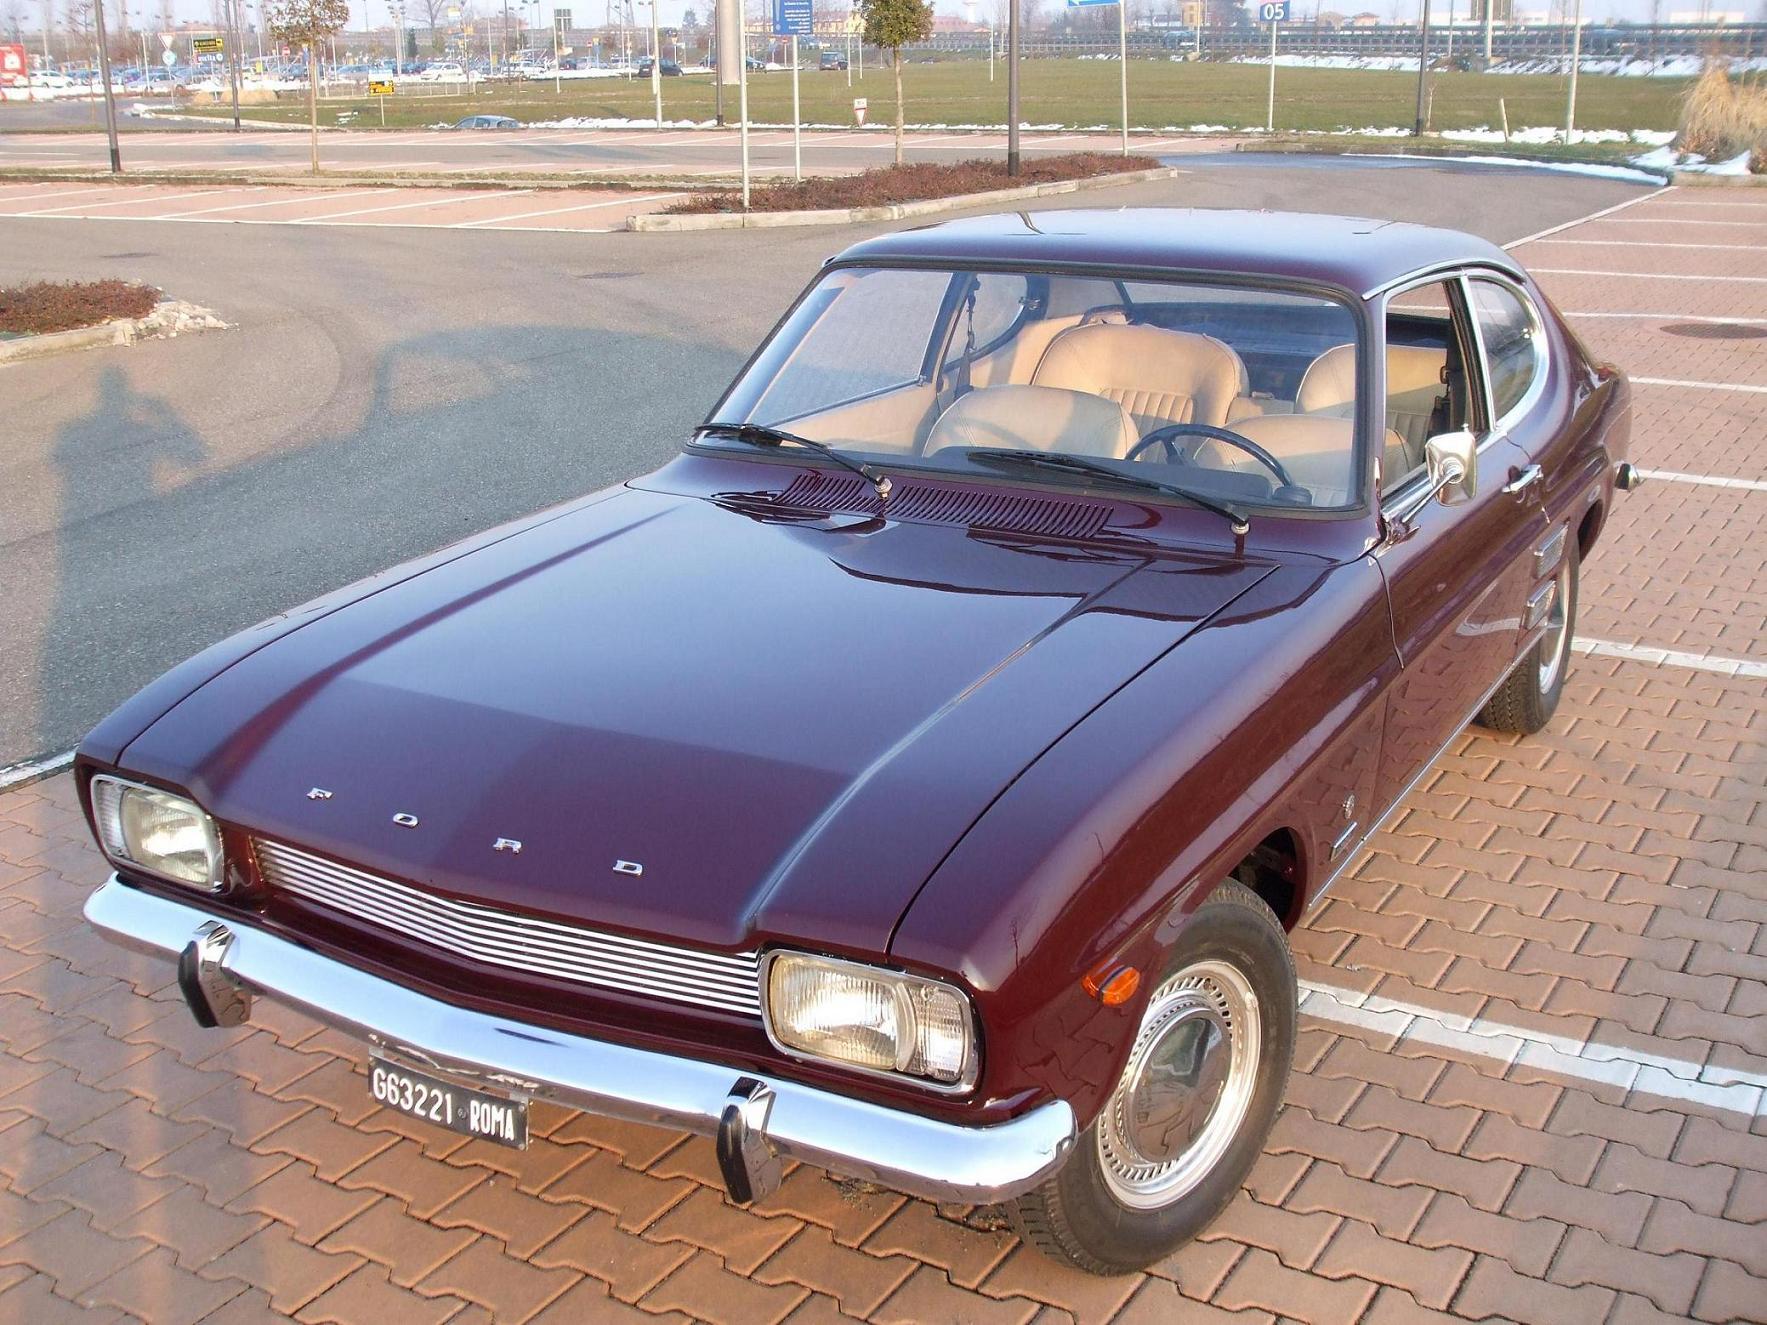 Ford capri mk1 1971